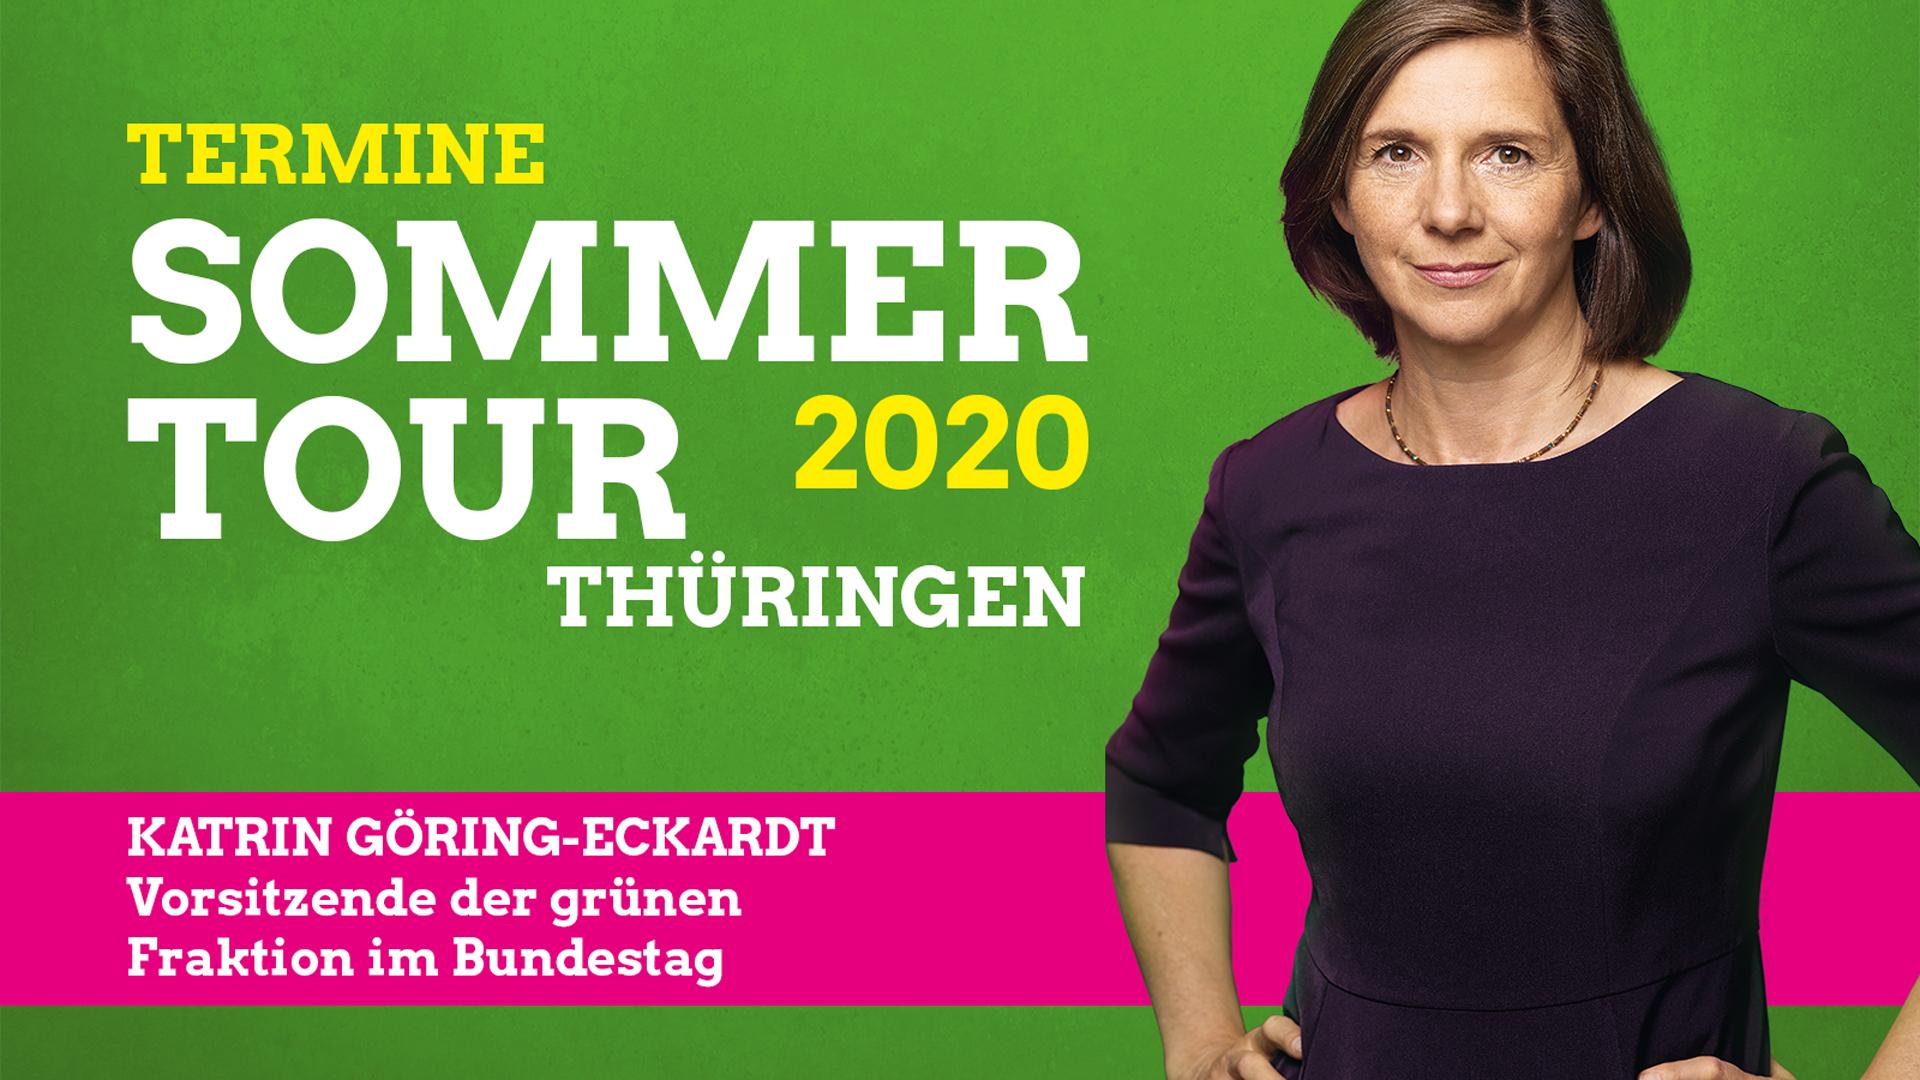 Auf Sommertour in Thüringen: Katrin Göring-Eckardt